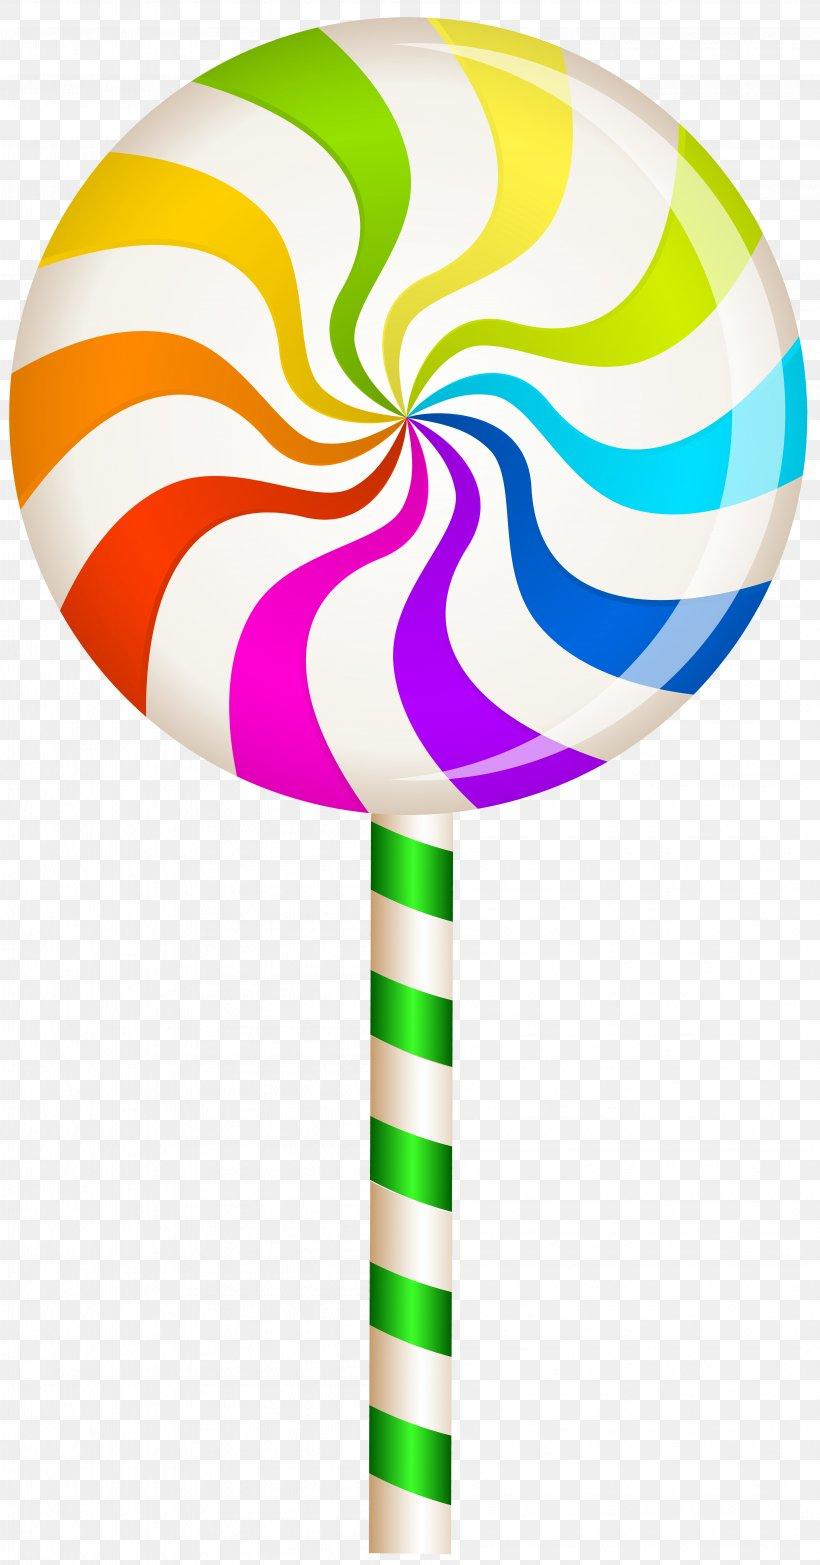 Lollipop Candy Confectionery Clip Art, PNG, 4191x8000px.